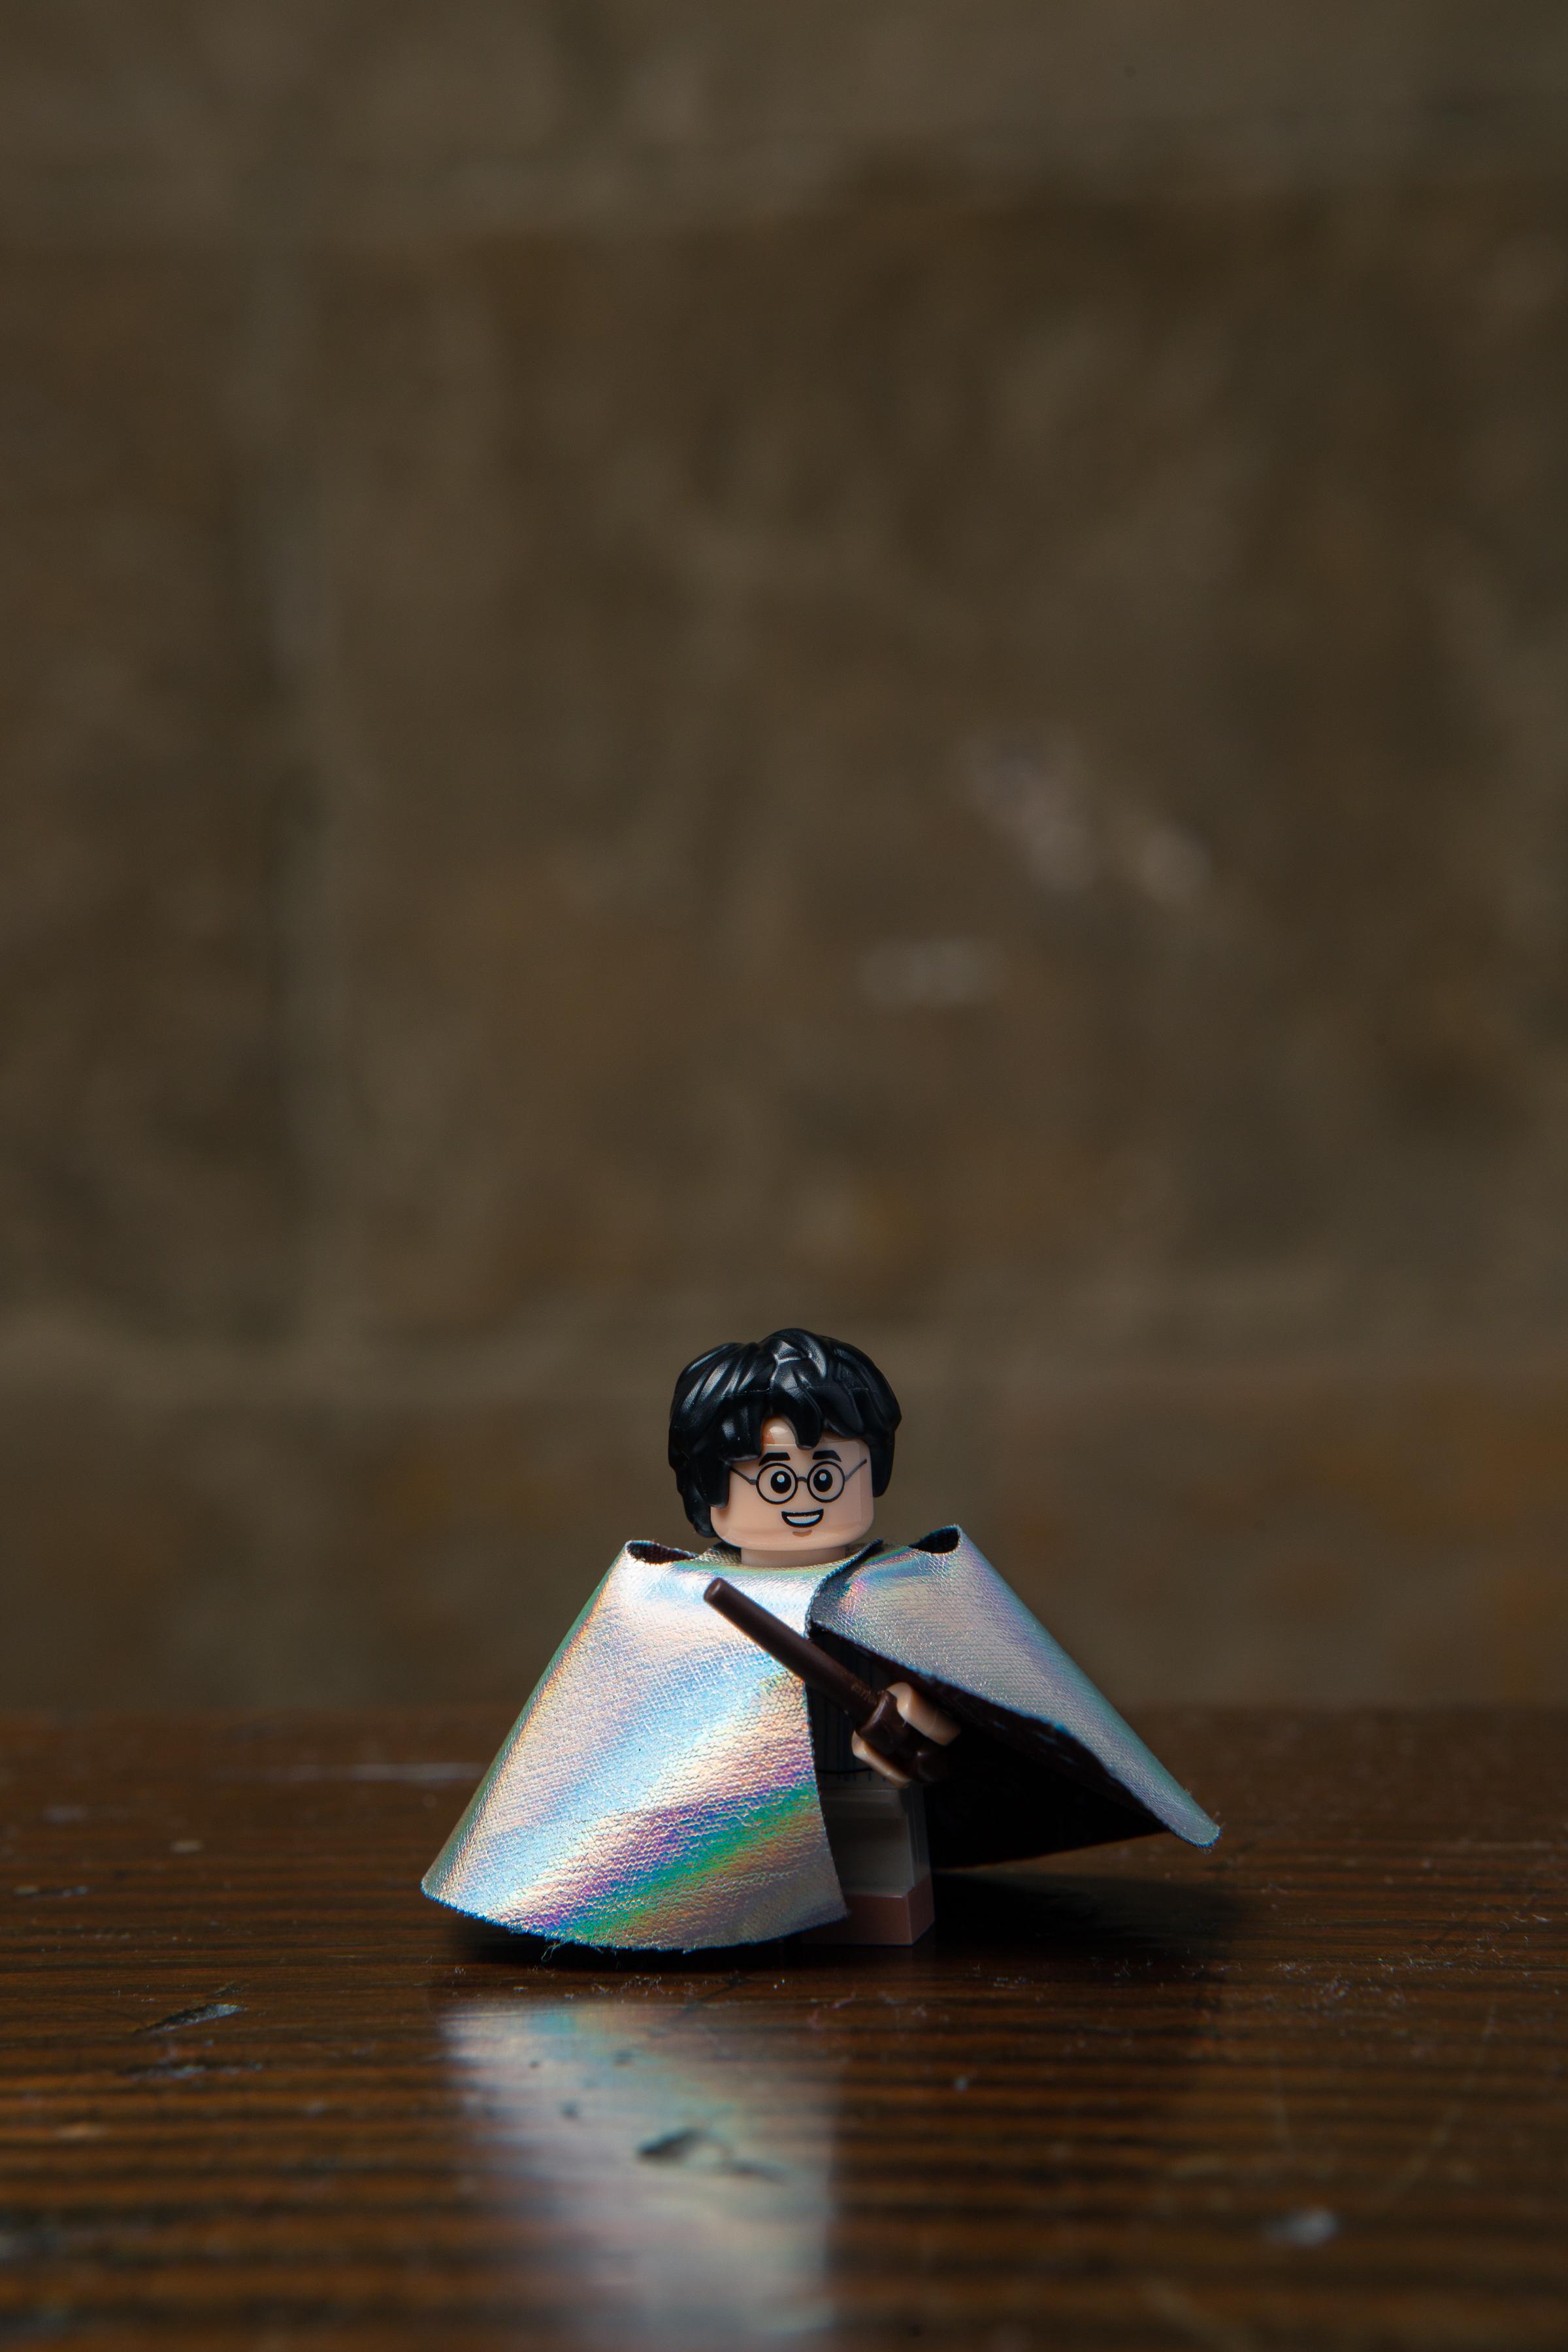 LEGO_WBST_19.06.18_hi-res-29.jpg